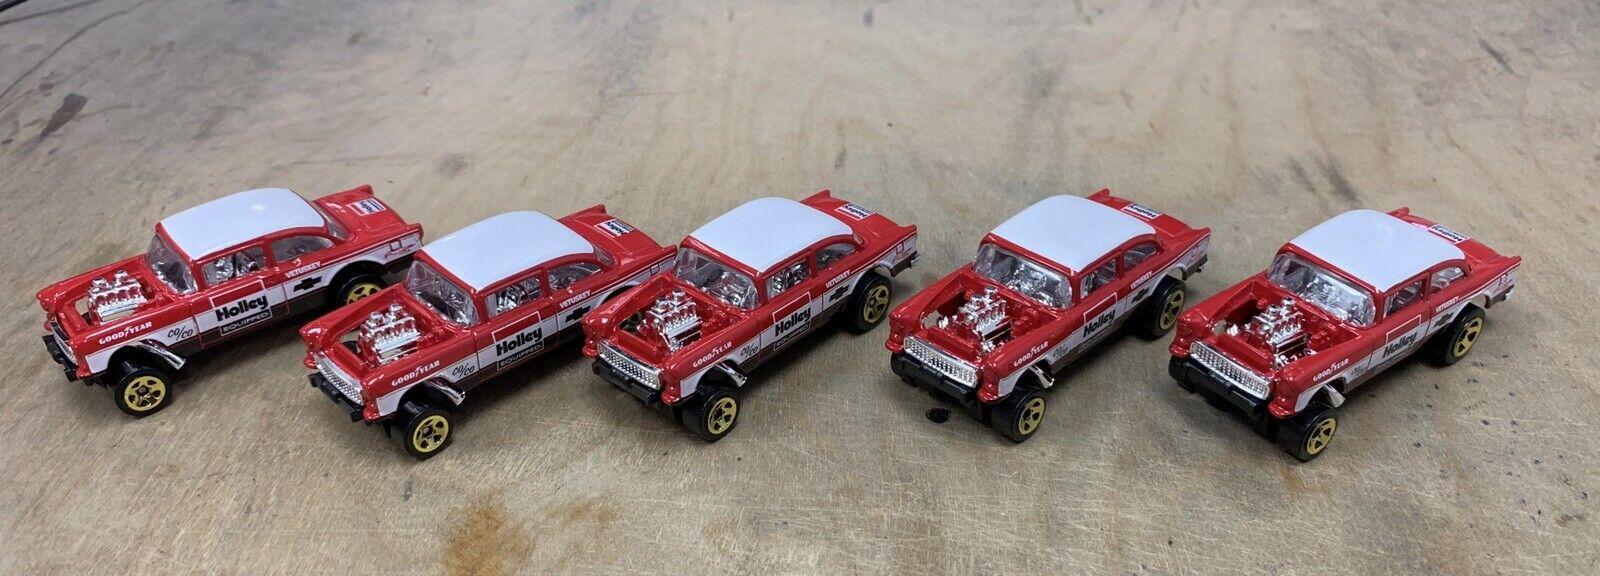 Hot Wheels New 2019 Chevy Gasser Exclusive Unspun Unrivet Loose lot of 5